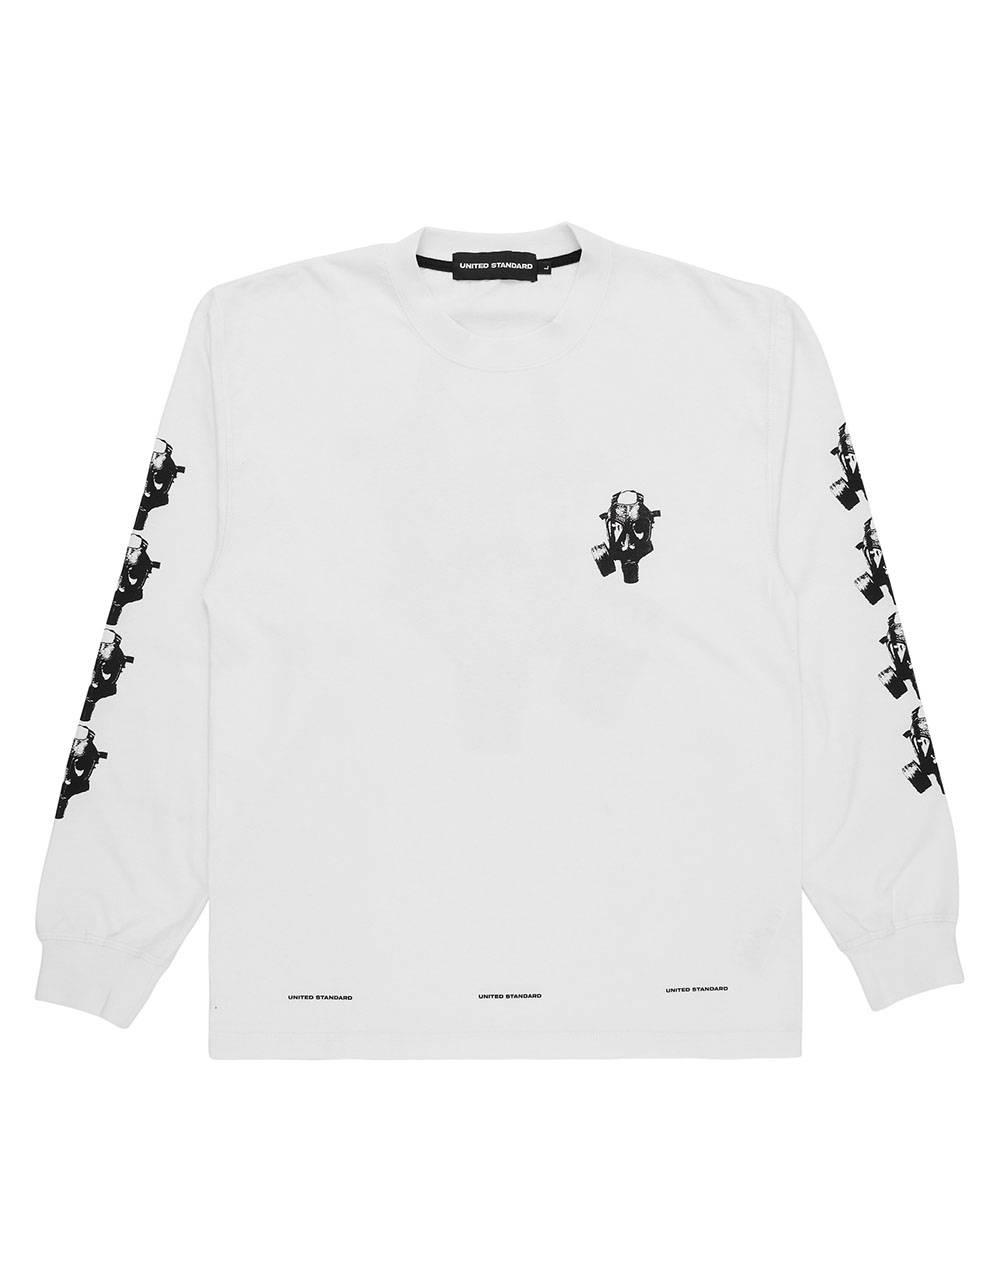 United Standard Mask longsleeve tee - white United Standard T-shirt 97,54€